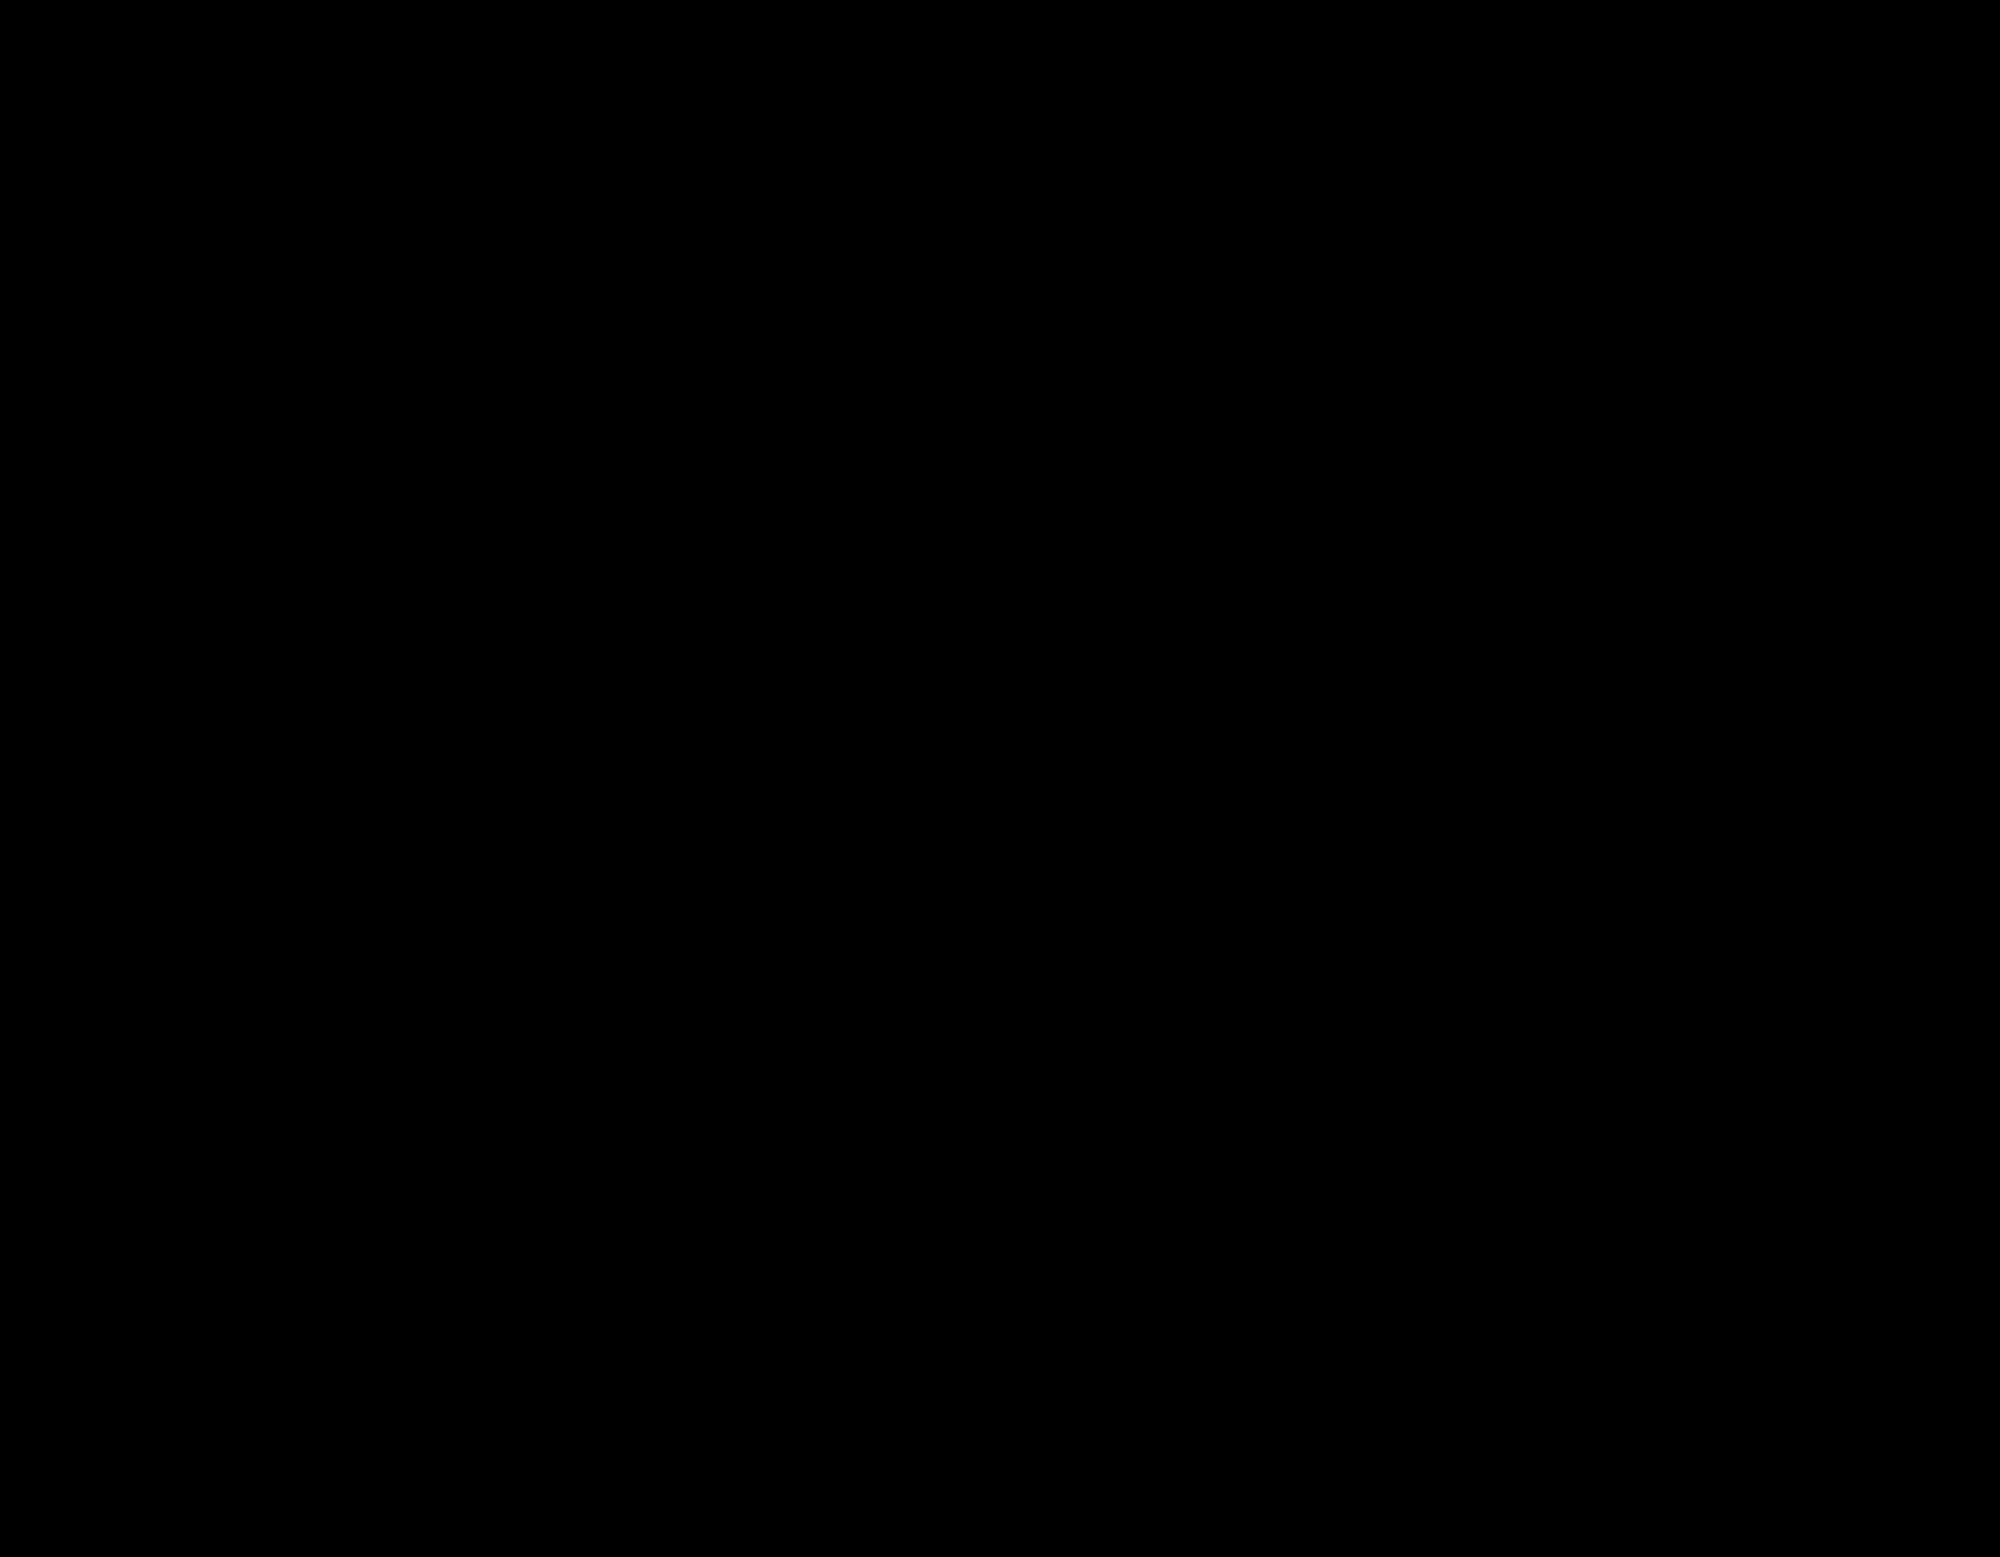 2000x1557 Filekiwi Silhouette By Flomar.svg